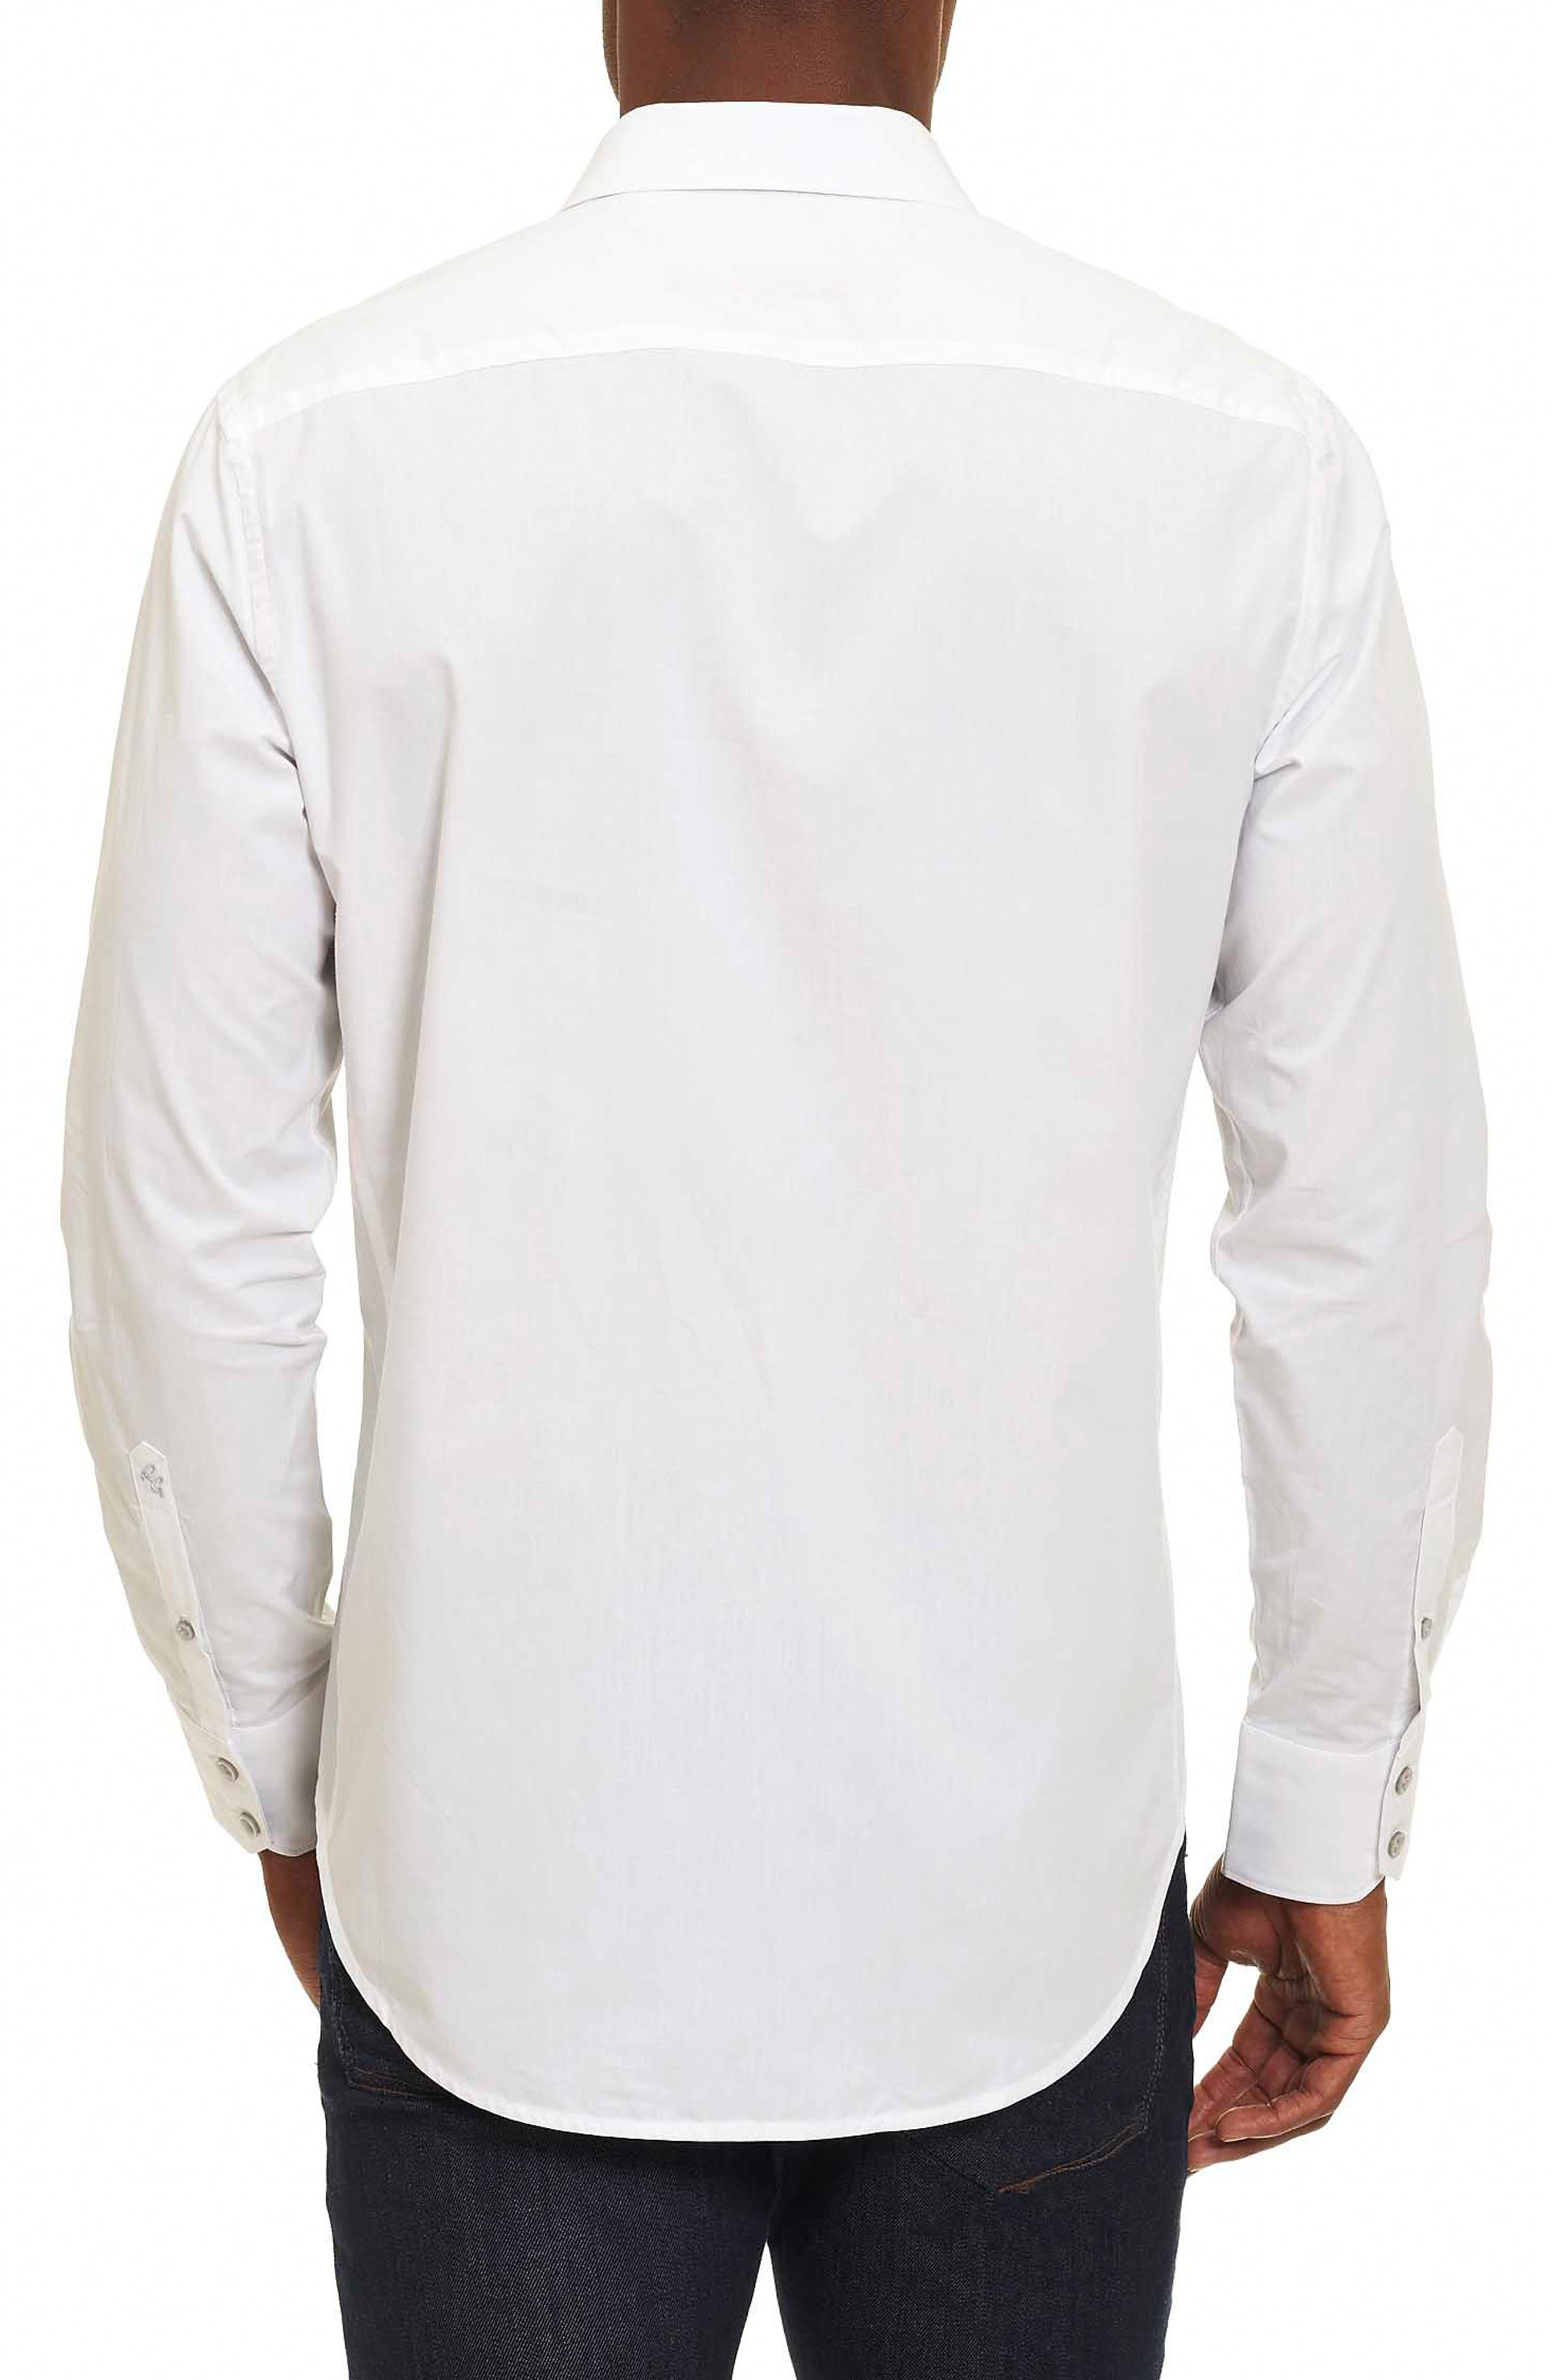 Groves Tailored Fit Sport Shirt,                             Alternate thumbnail 2, color,                             100